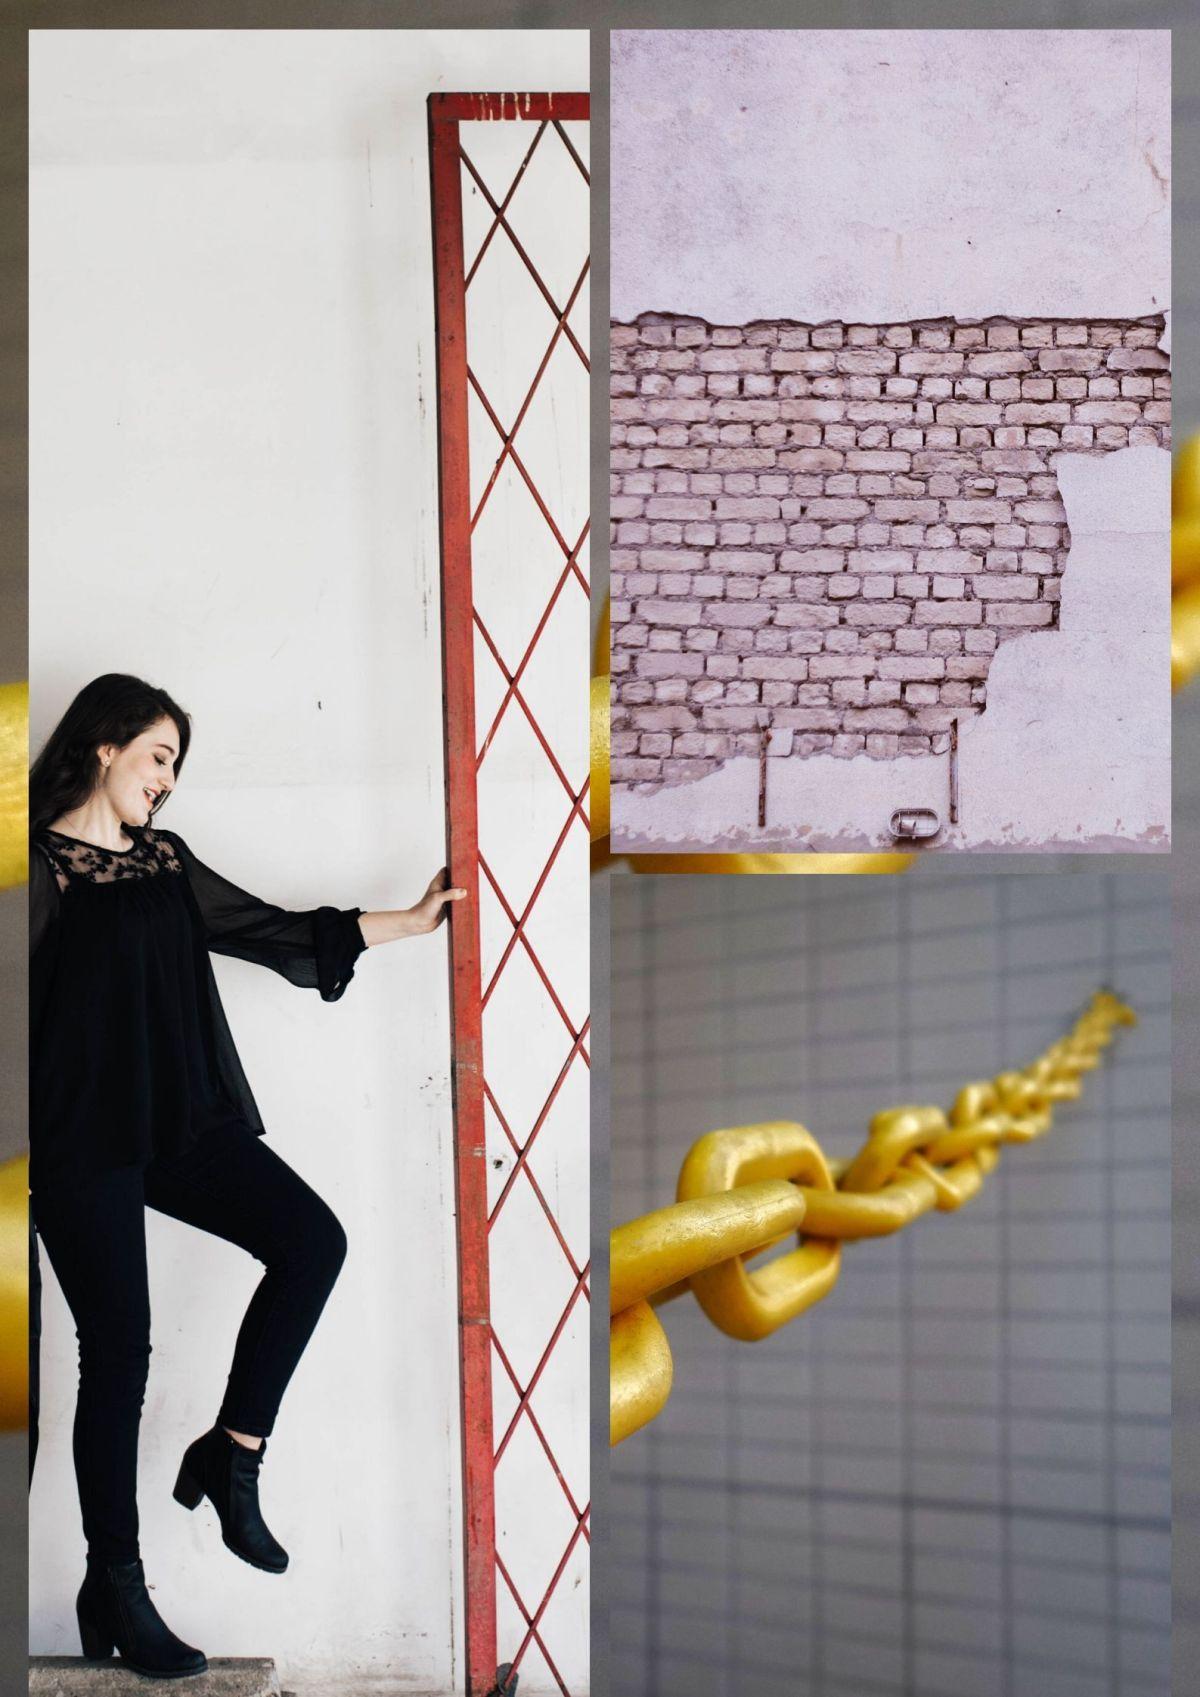 muros ou limites